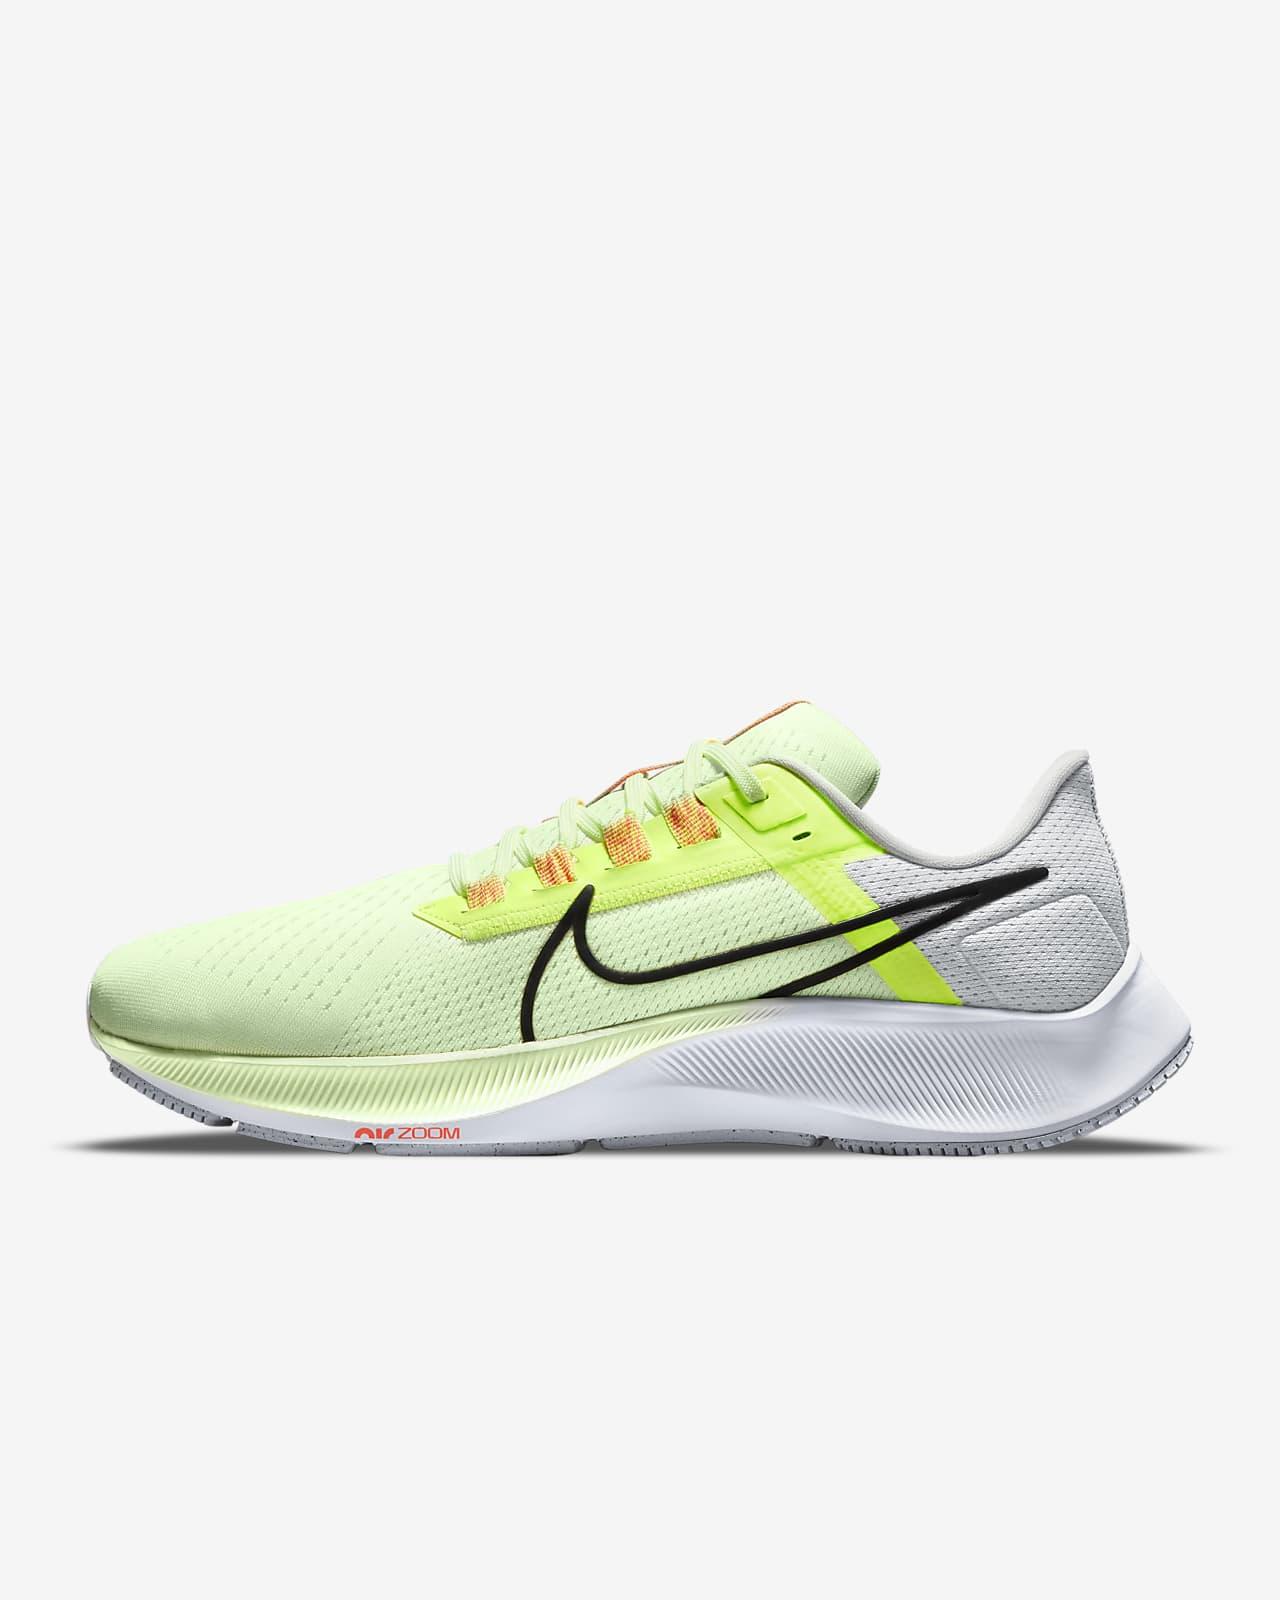 Chaussures de running Nike Air Zoom Pegasus38 pour Homme